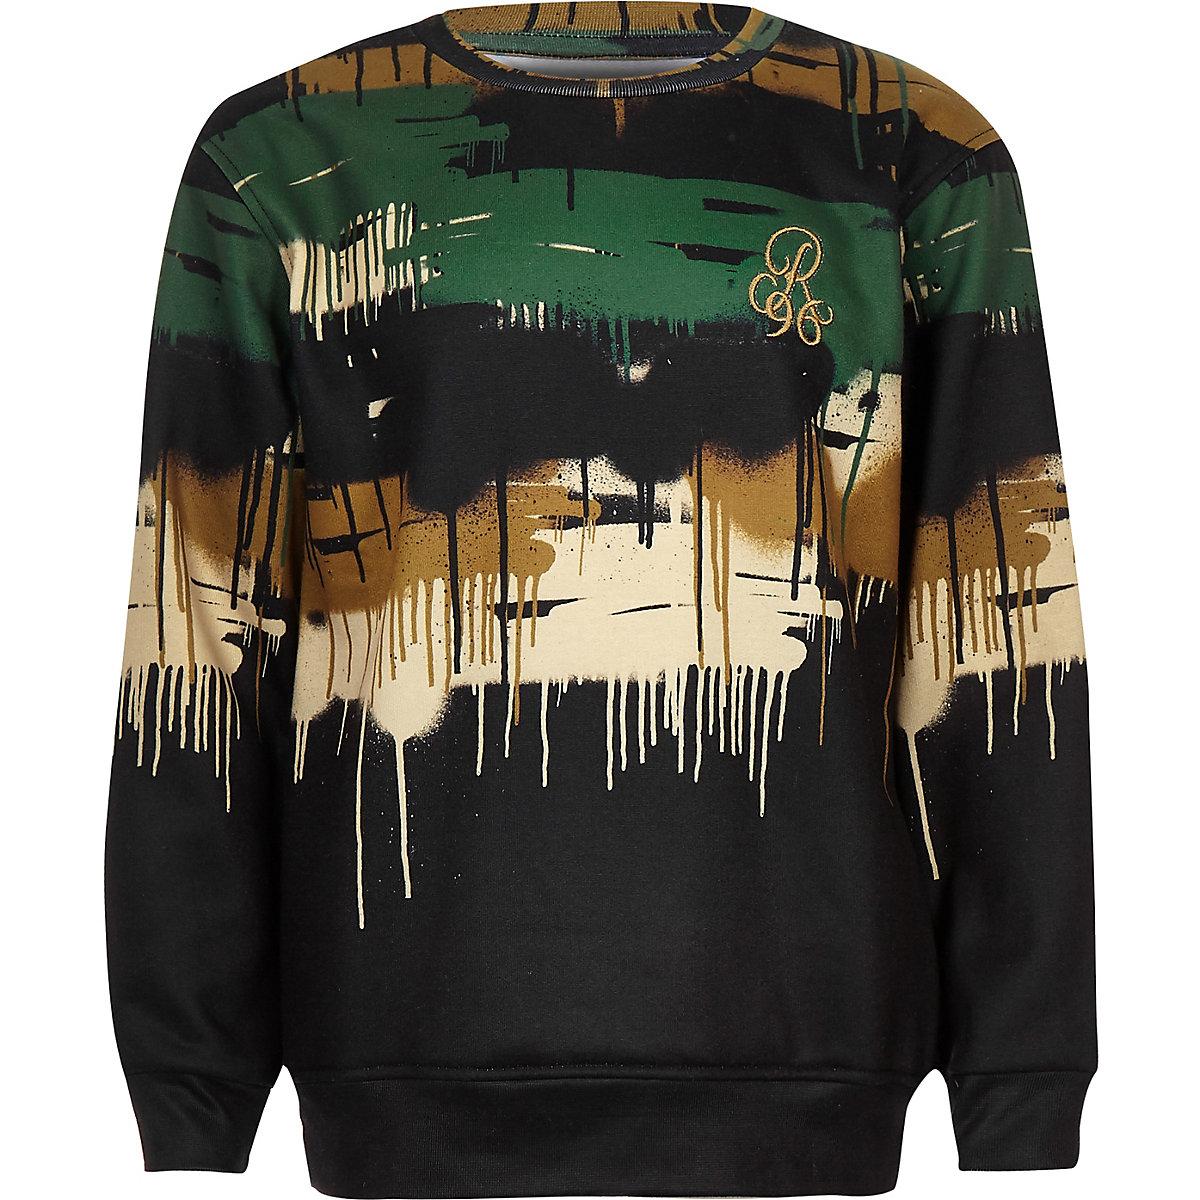 Boys black camo drip sweatshirt